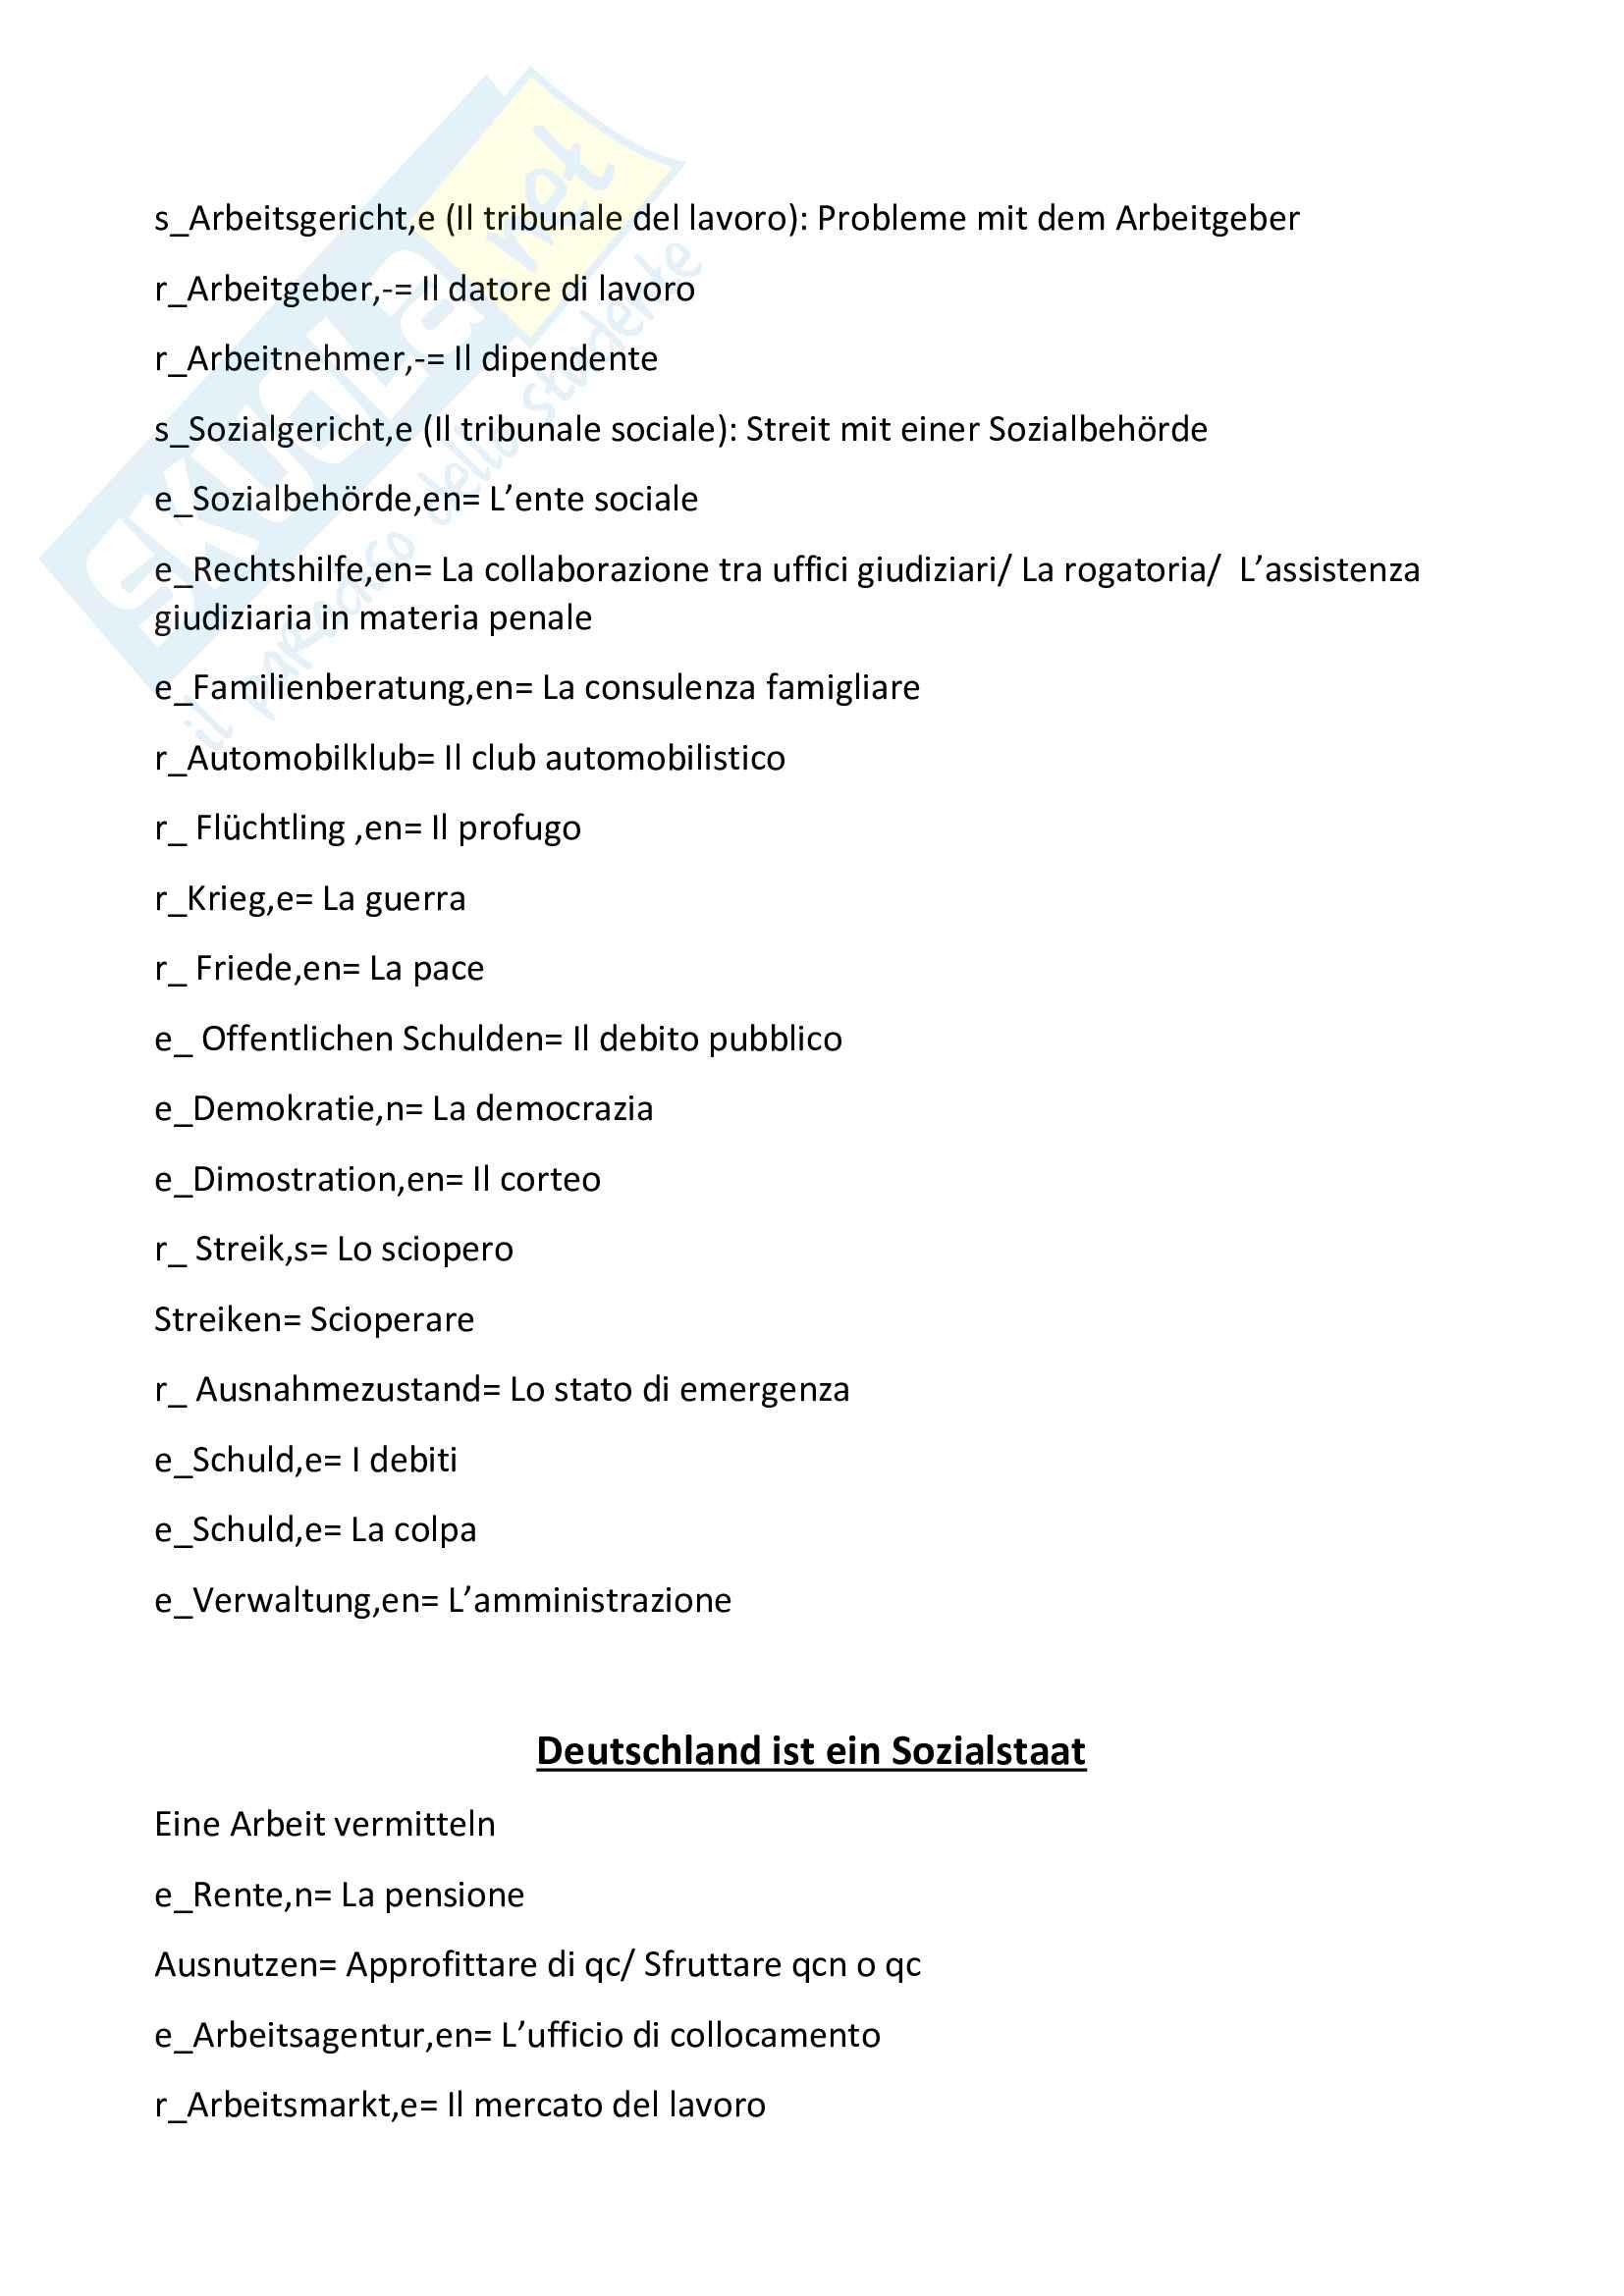 Appunti linguaggi settoriali tedesco Pag. 2